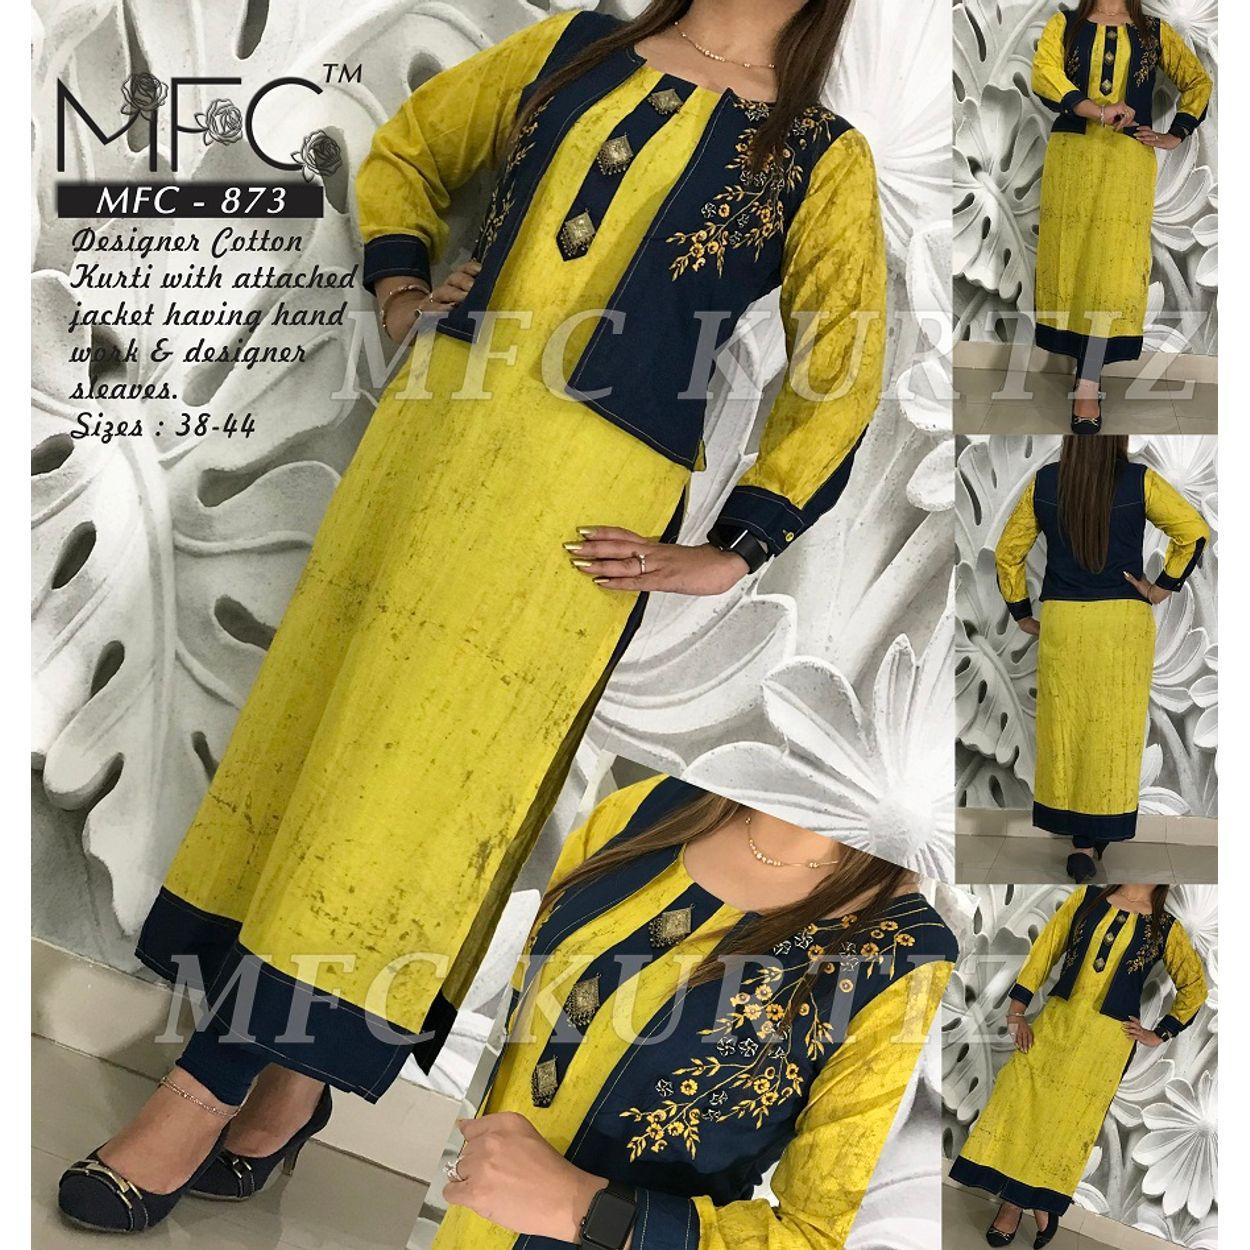 MFC-873 Designer cotton kurti with attached jacket having handwork &  Designer sleeves